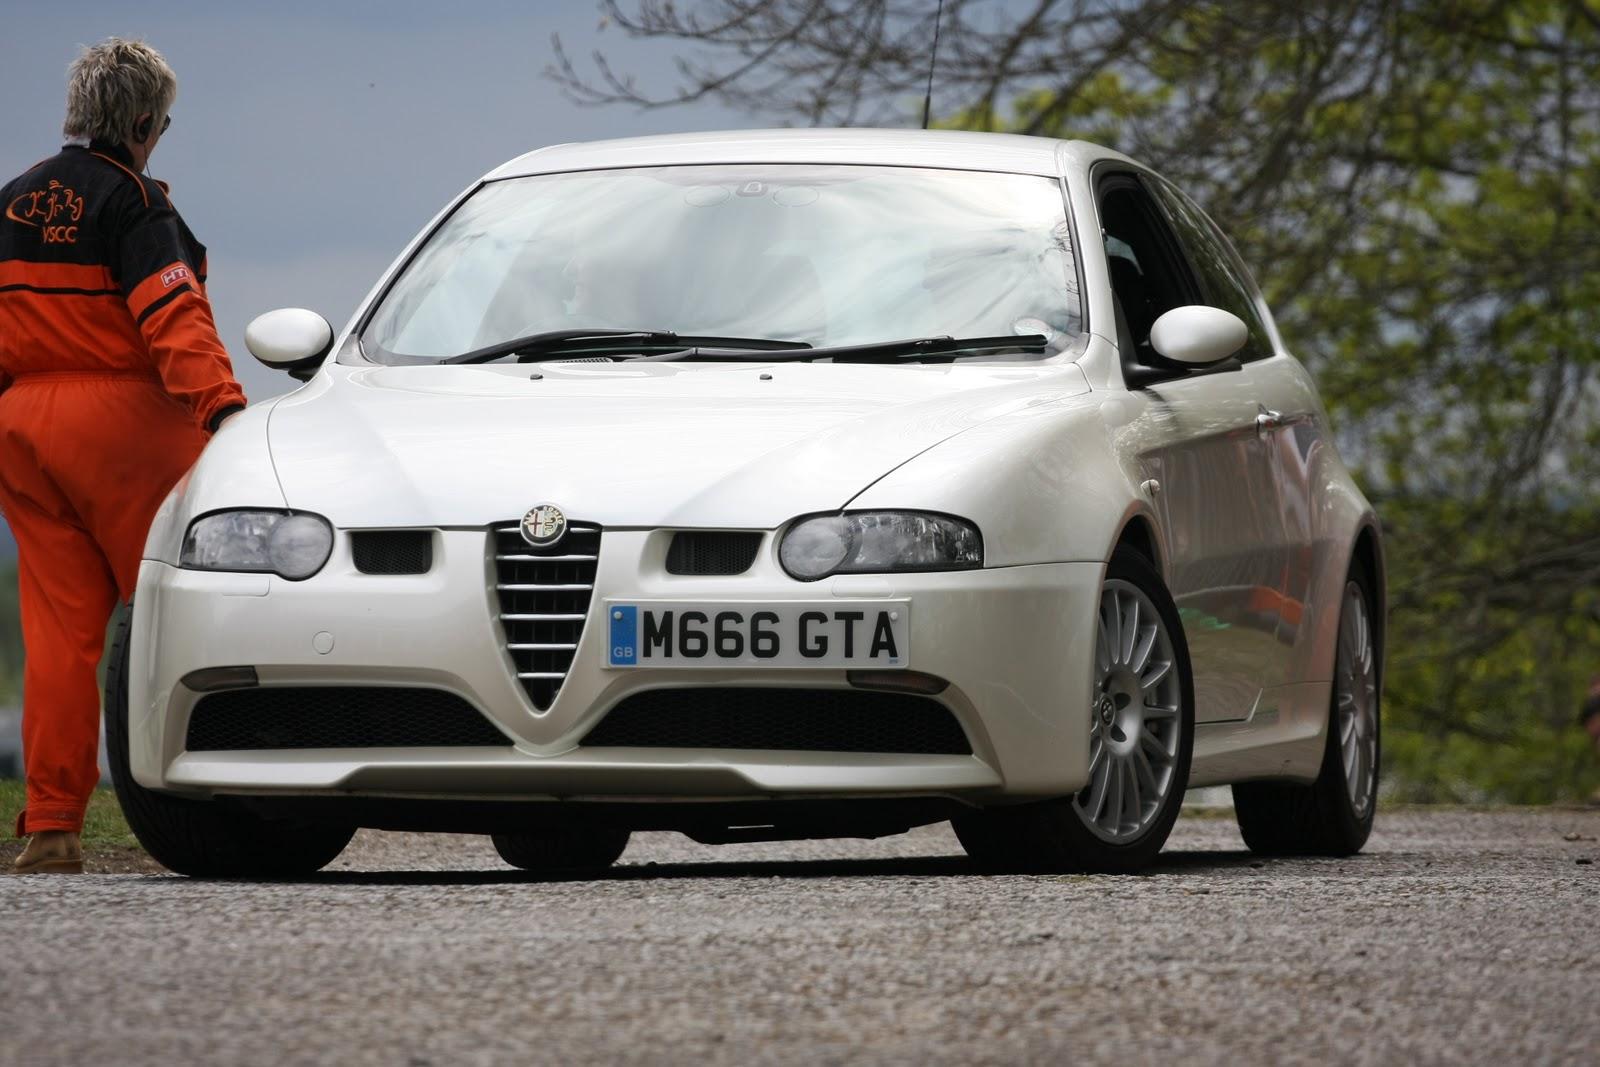 http://3.bp.blogspot.com/_QEKFOK_r_p4/TOPbit_cCtI/AAAAAAAABCM/C9ZnTnqyvXY/s1600/Alfa+Romeo+147+GTA.jpg